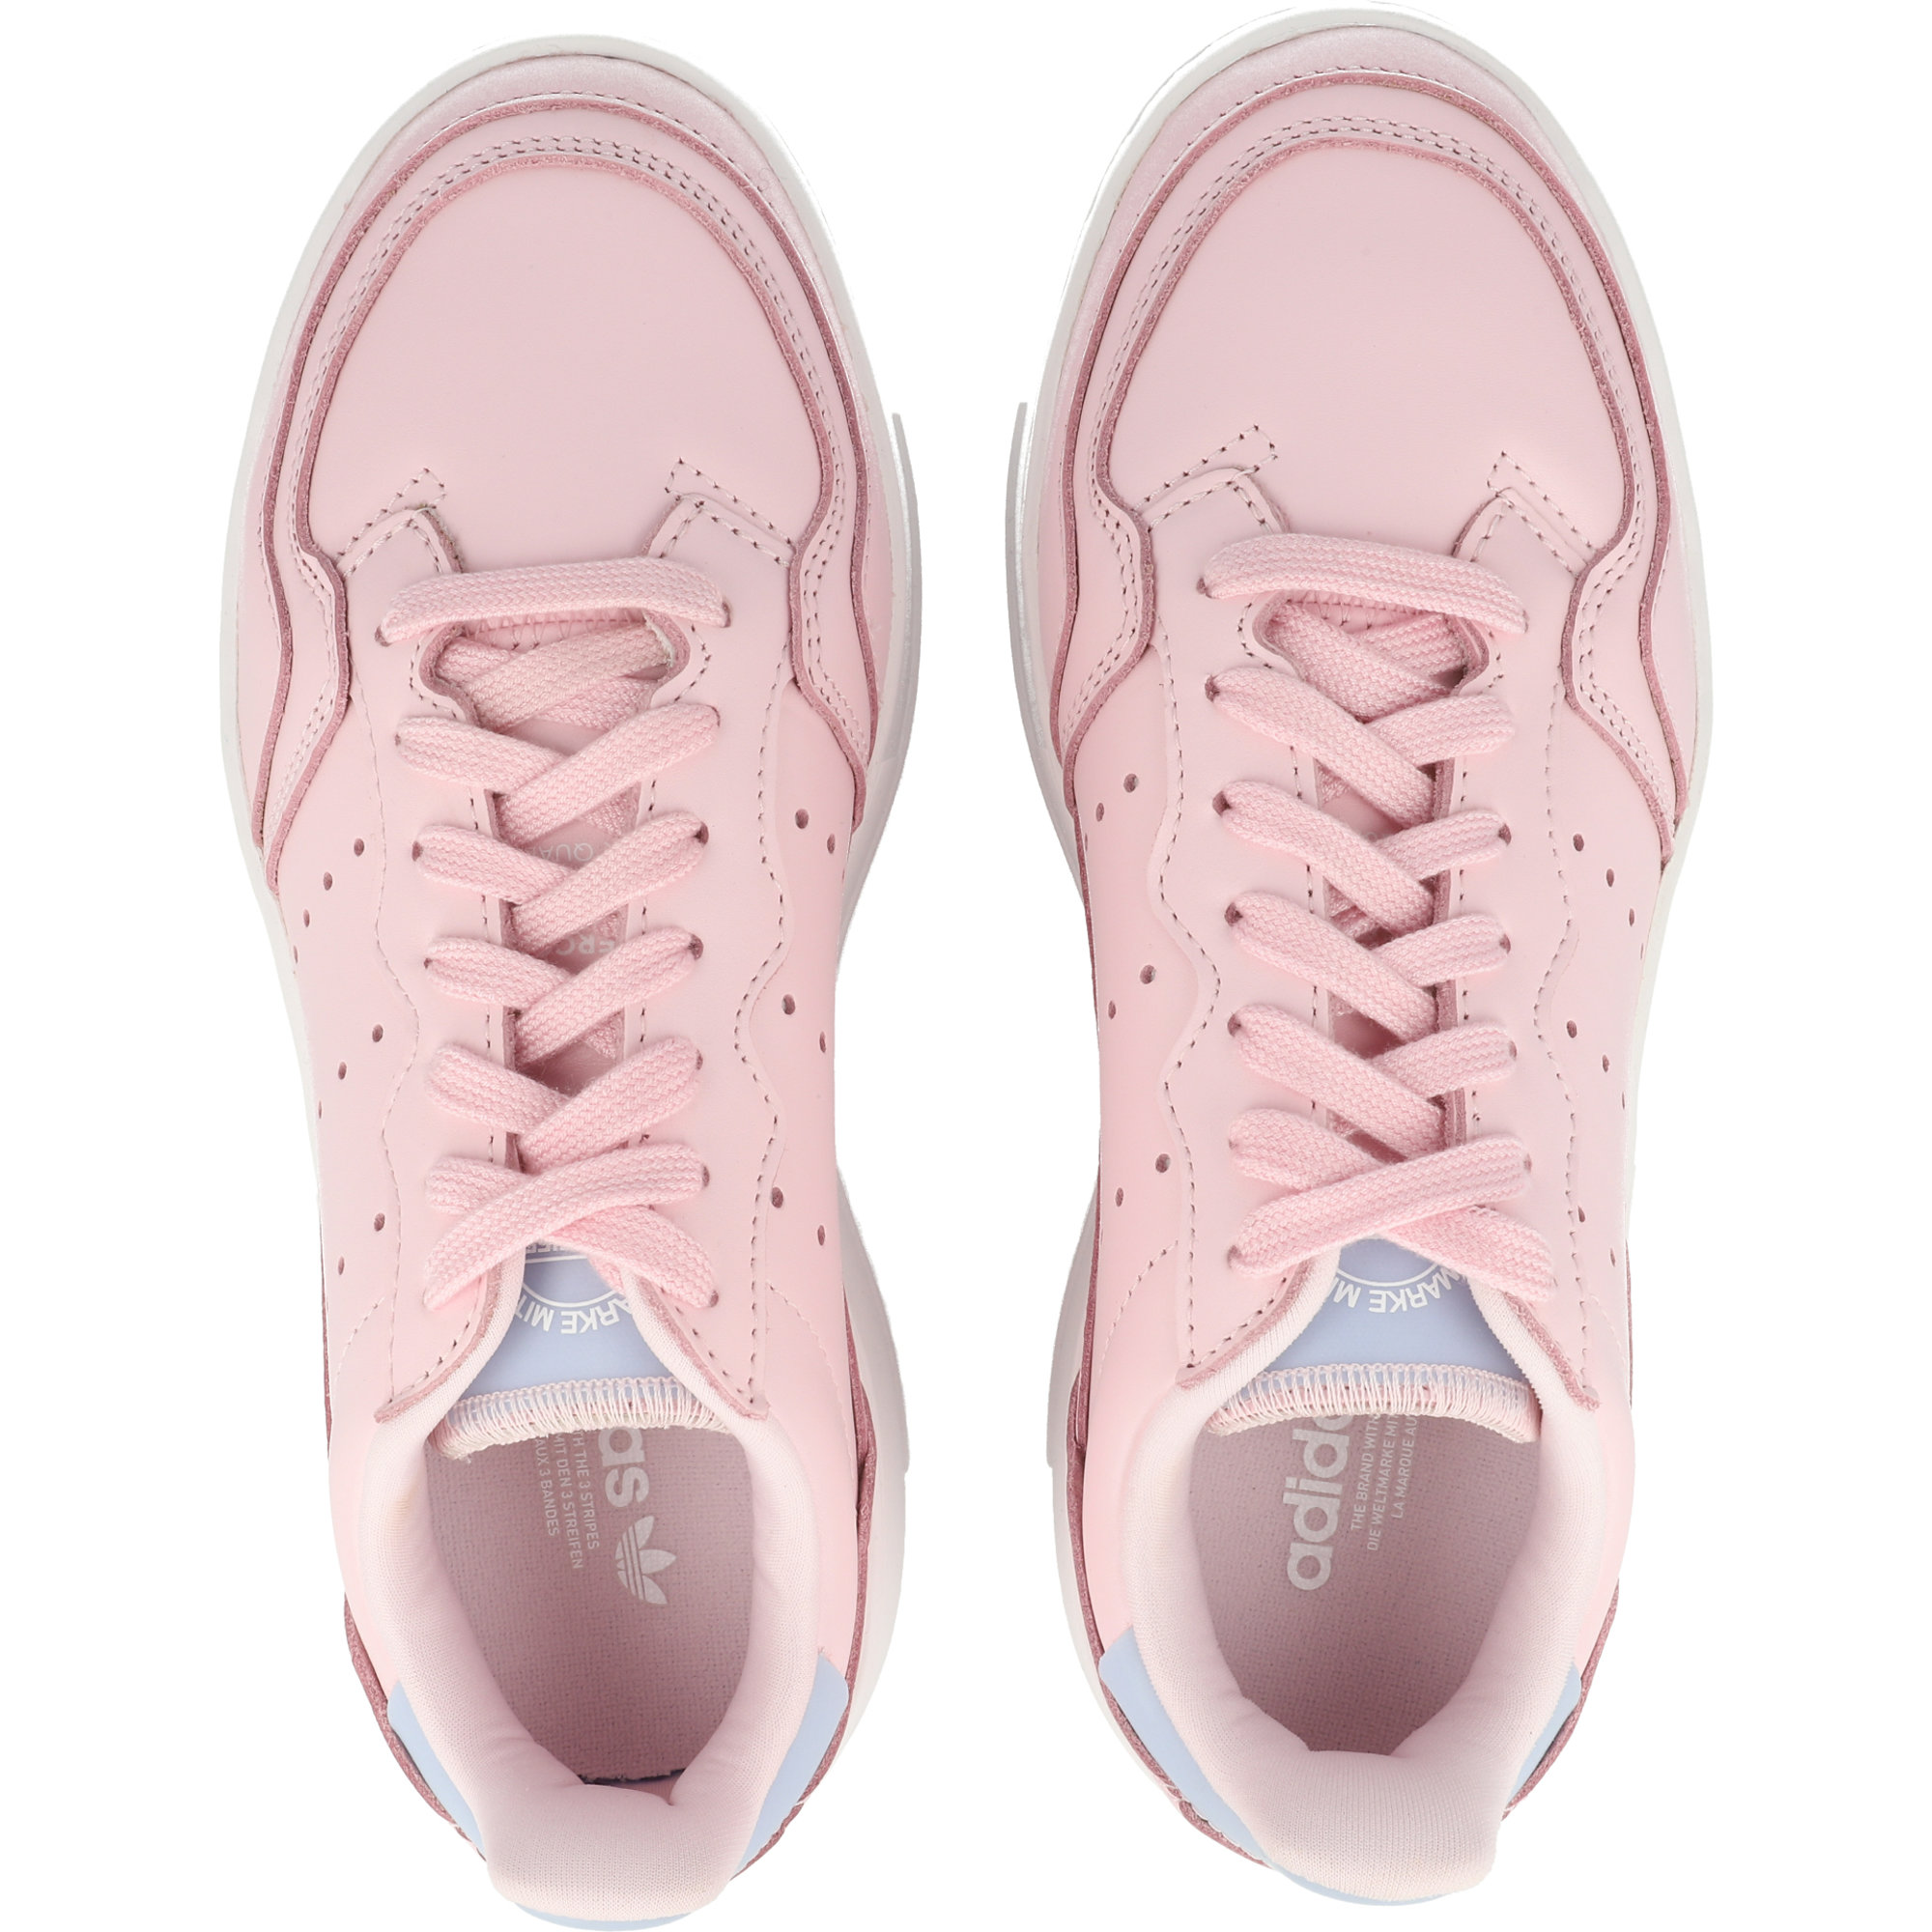 adidas Originals Supercourt W Clear Pink/Aero Blue Leather